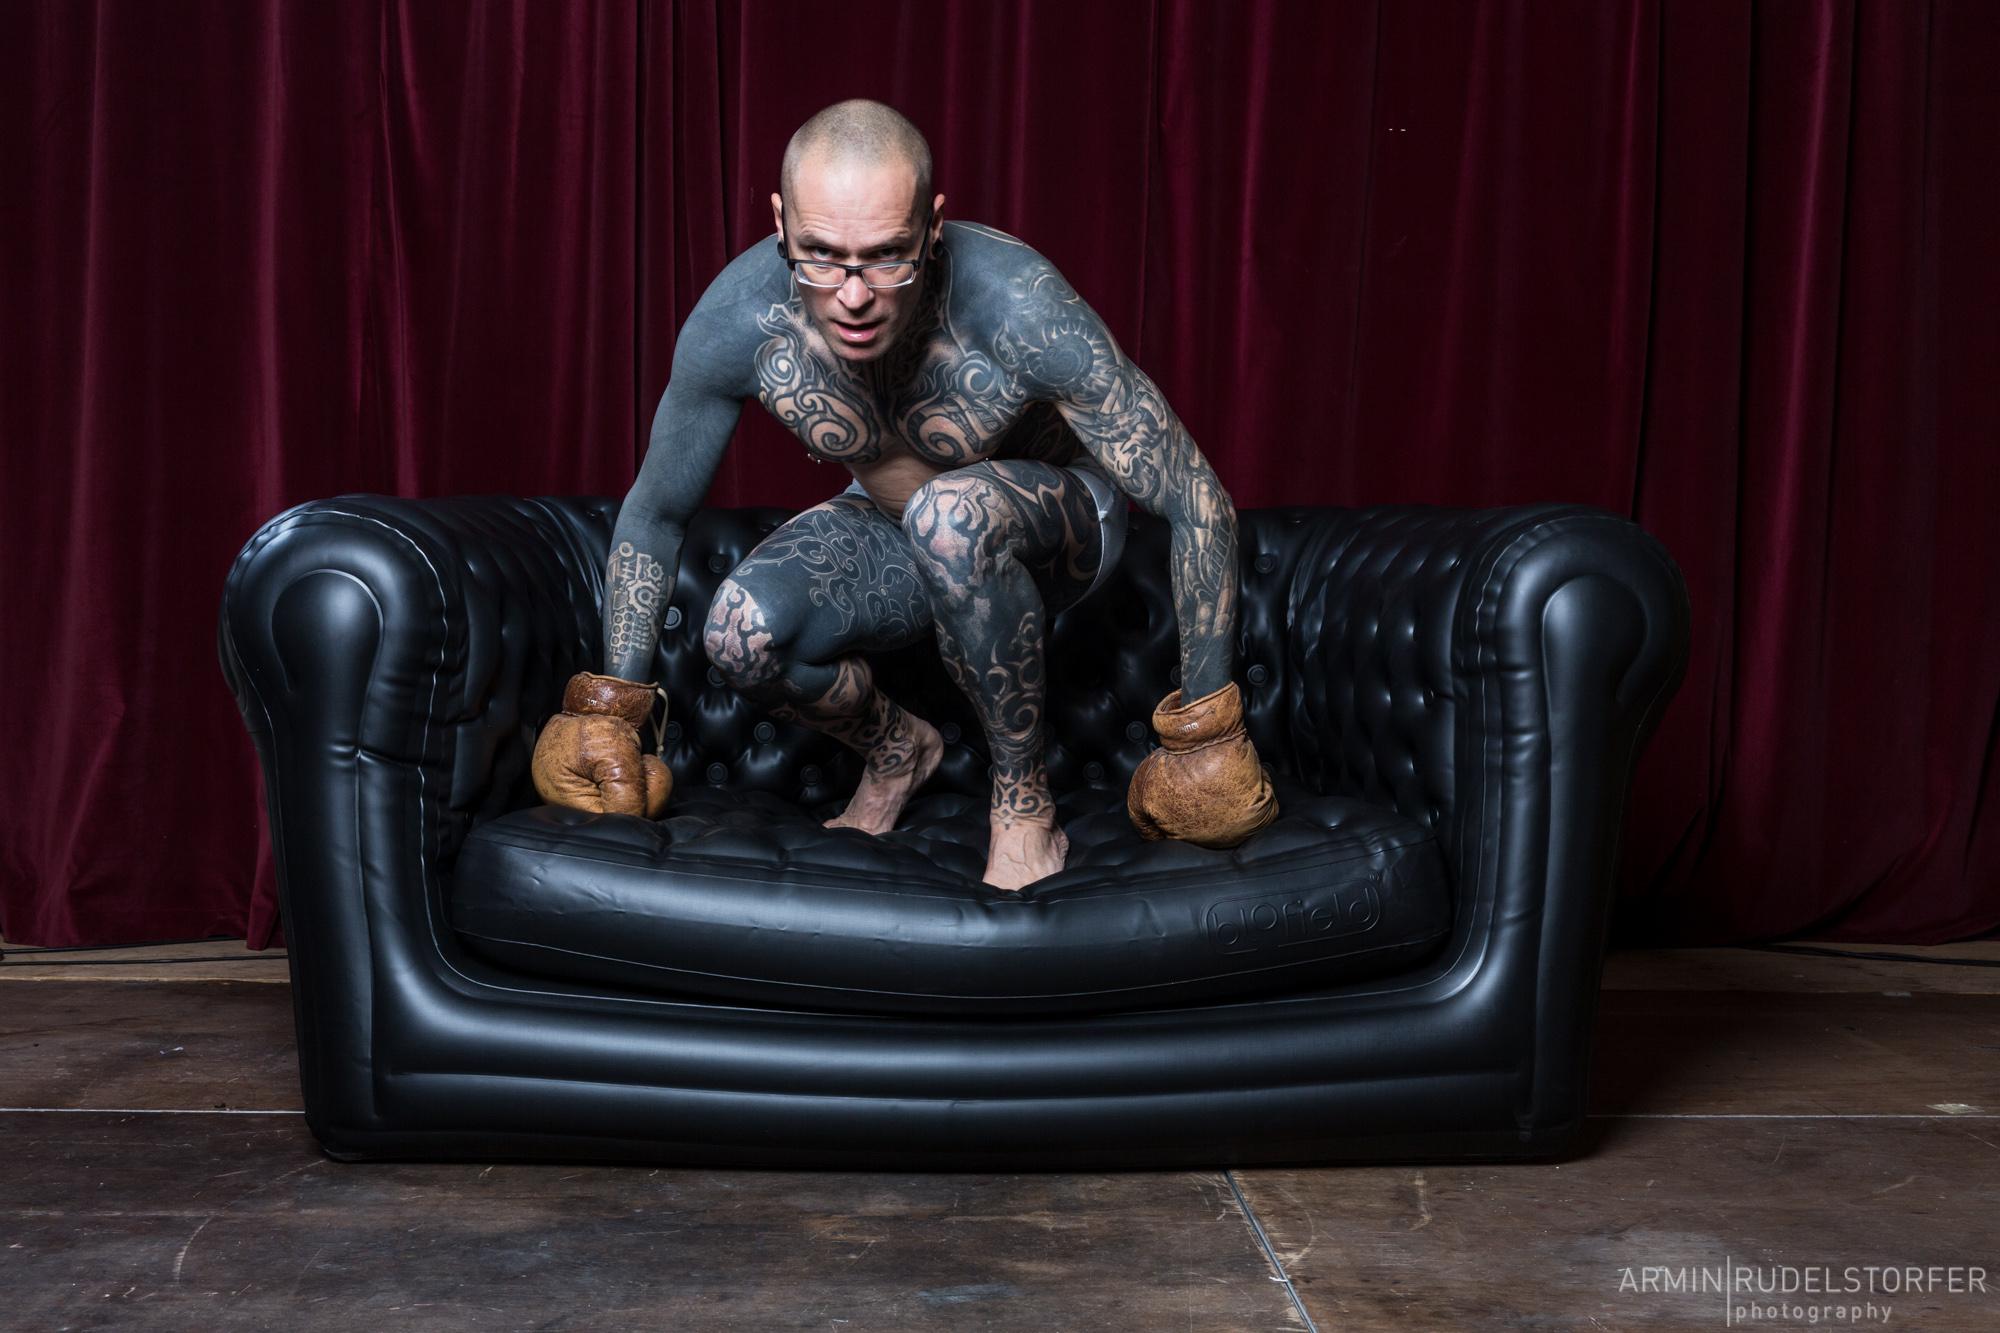 amanda palmer edwyn collins karl markovics auf der couch. Black Bedroom Furniture Sets. Home Design Ideas